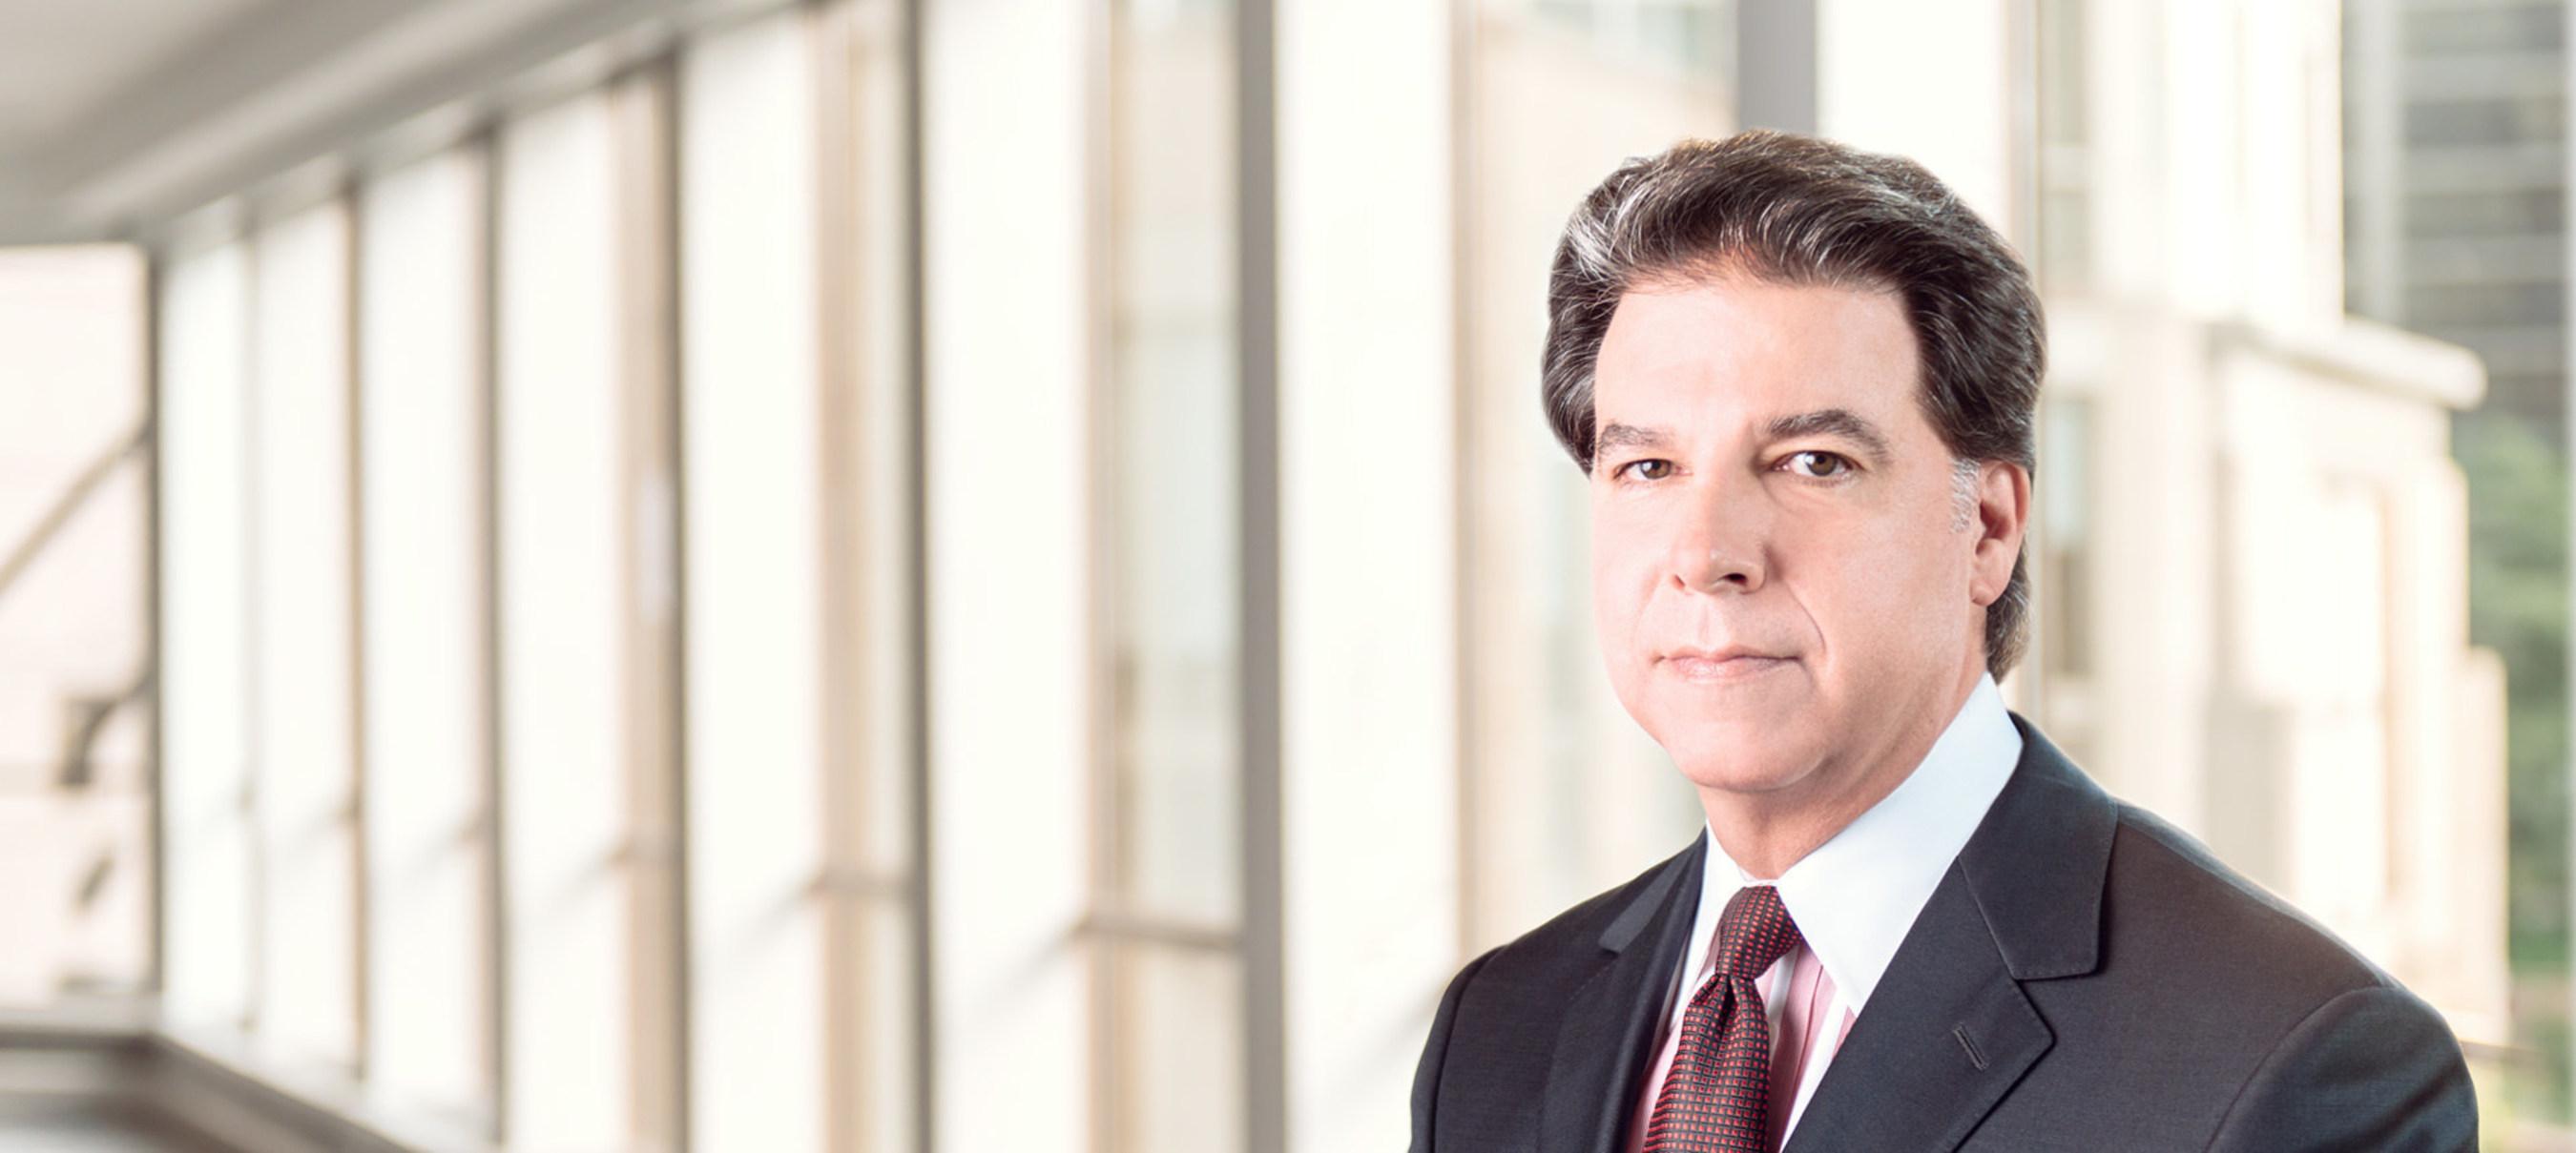 Carlos Garcia Named to Lead the Heidrick & Struggles Los Angeles Office